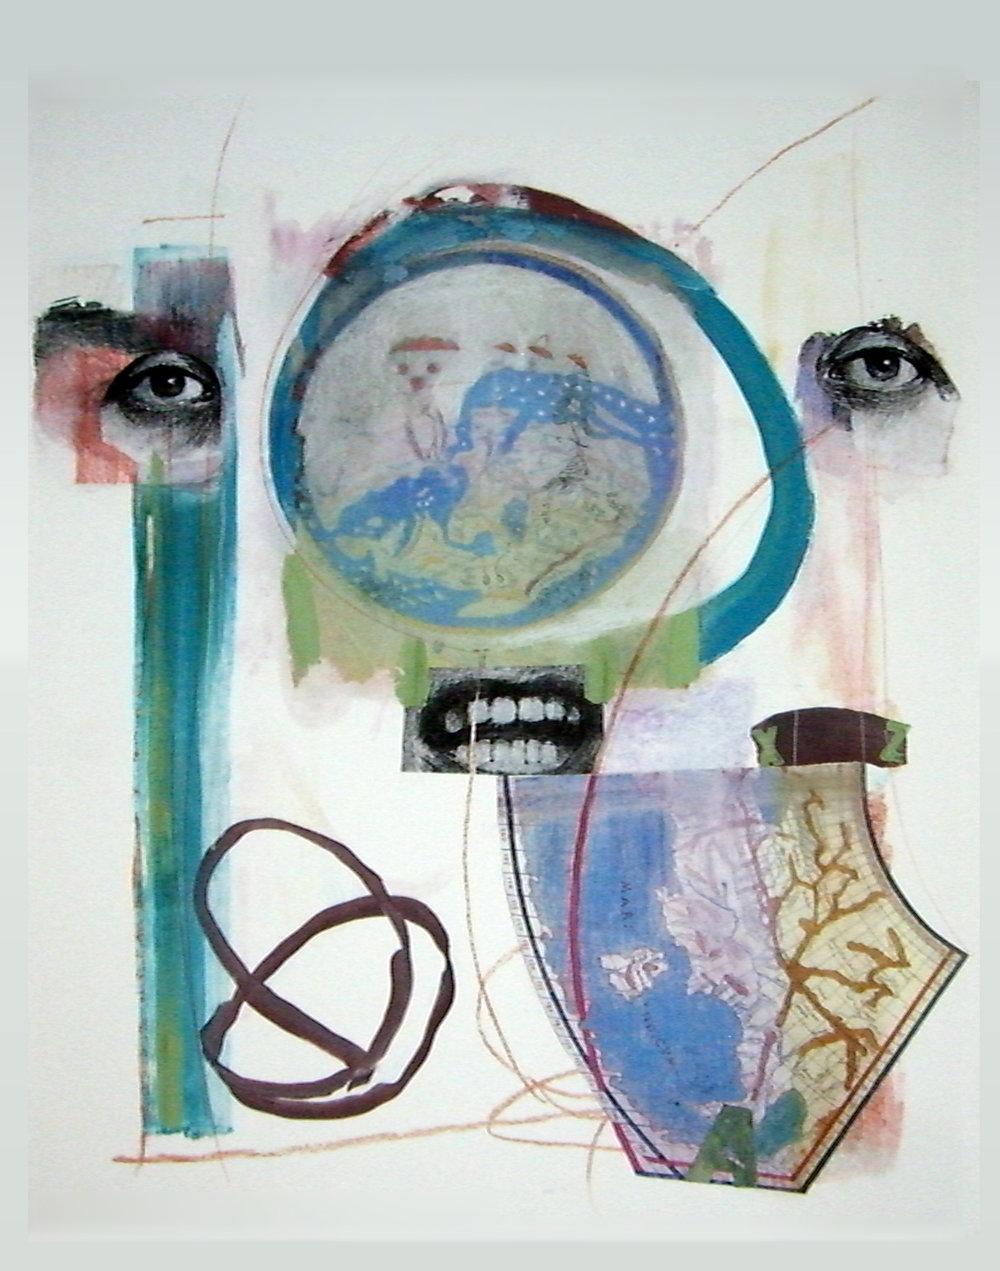 John Kollig, from Dada print series